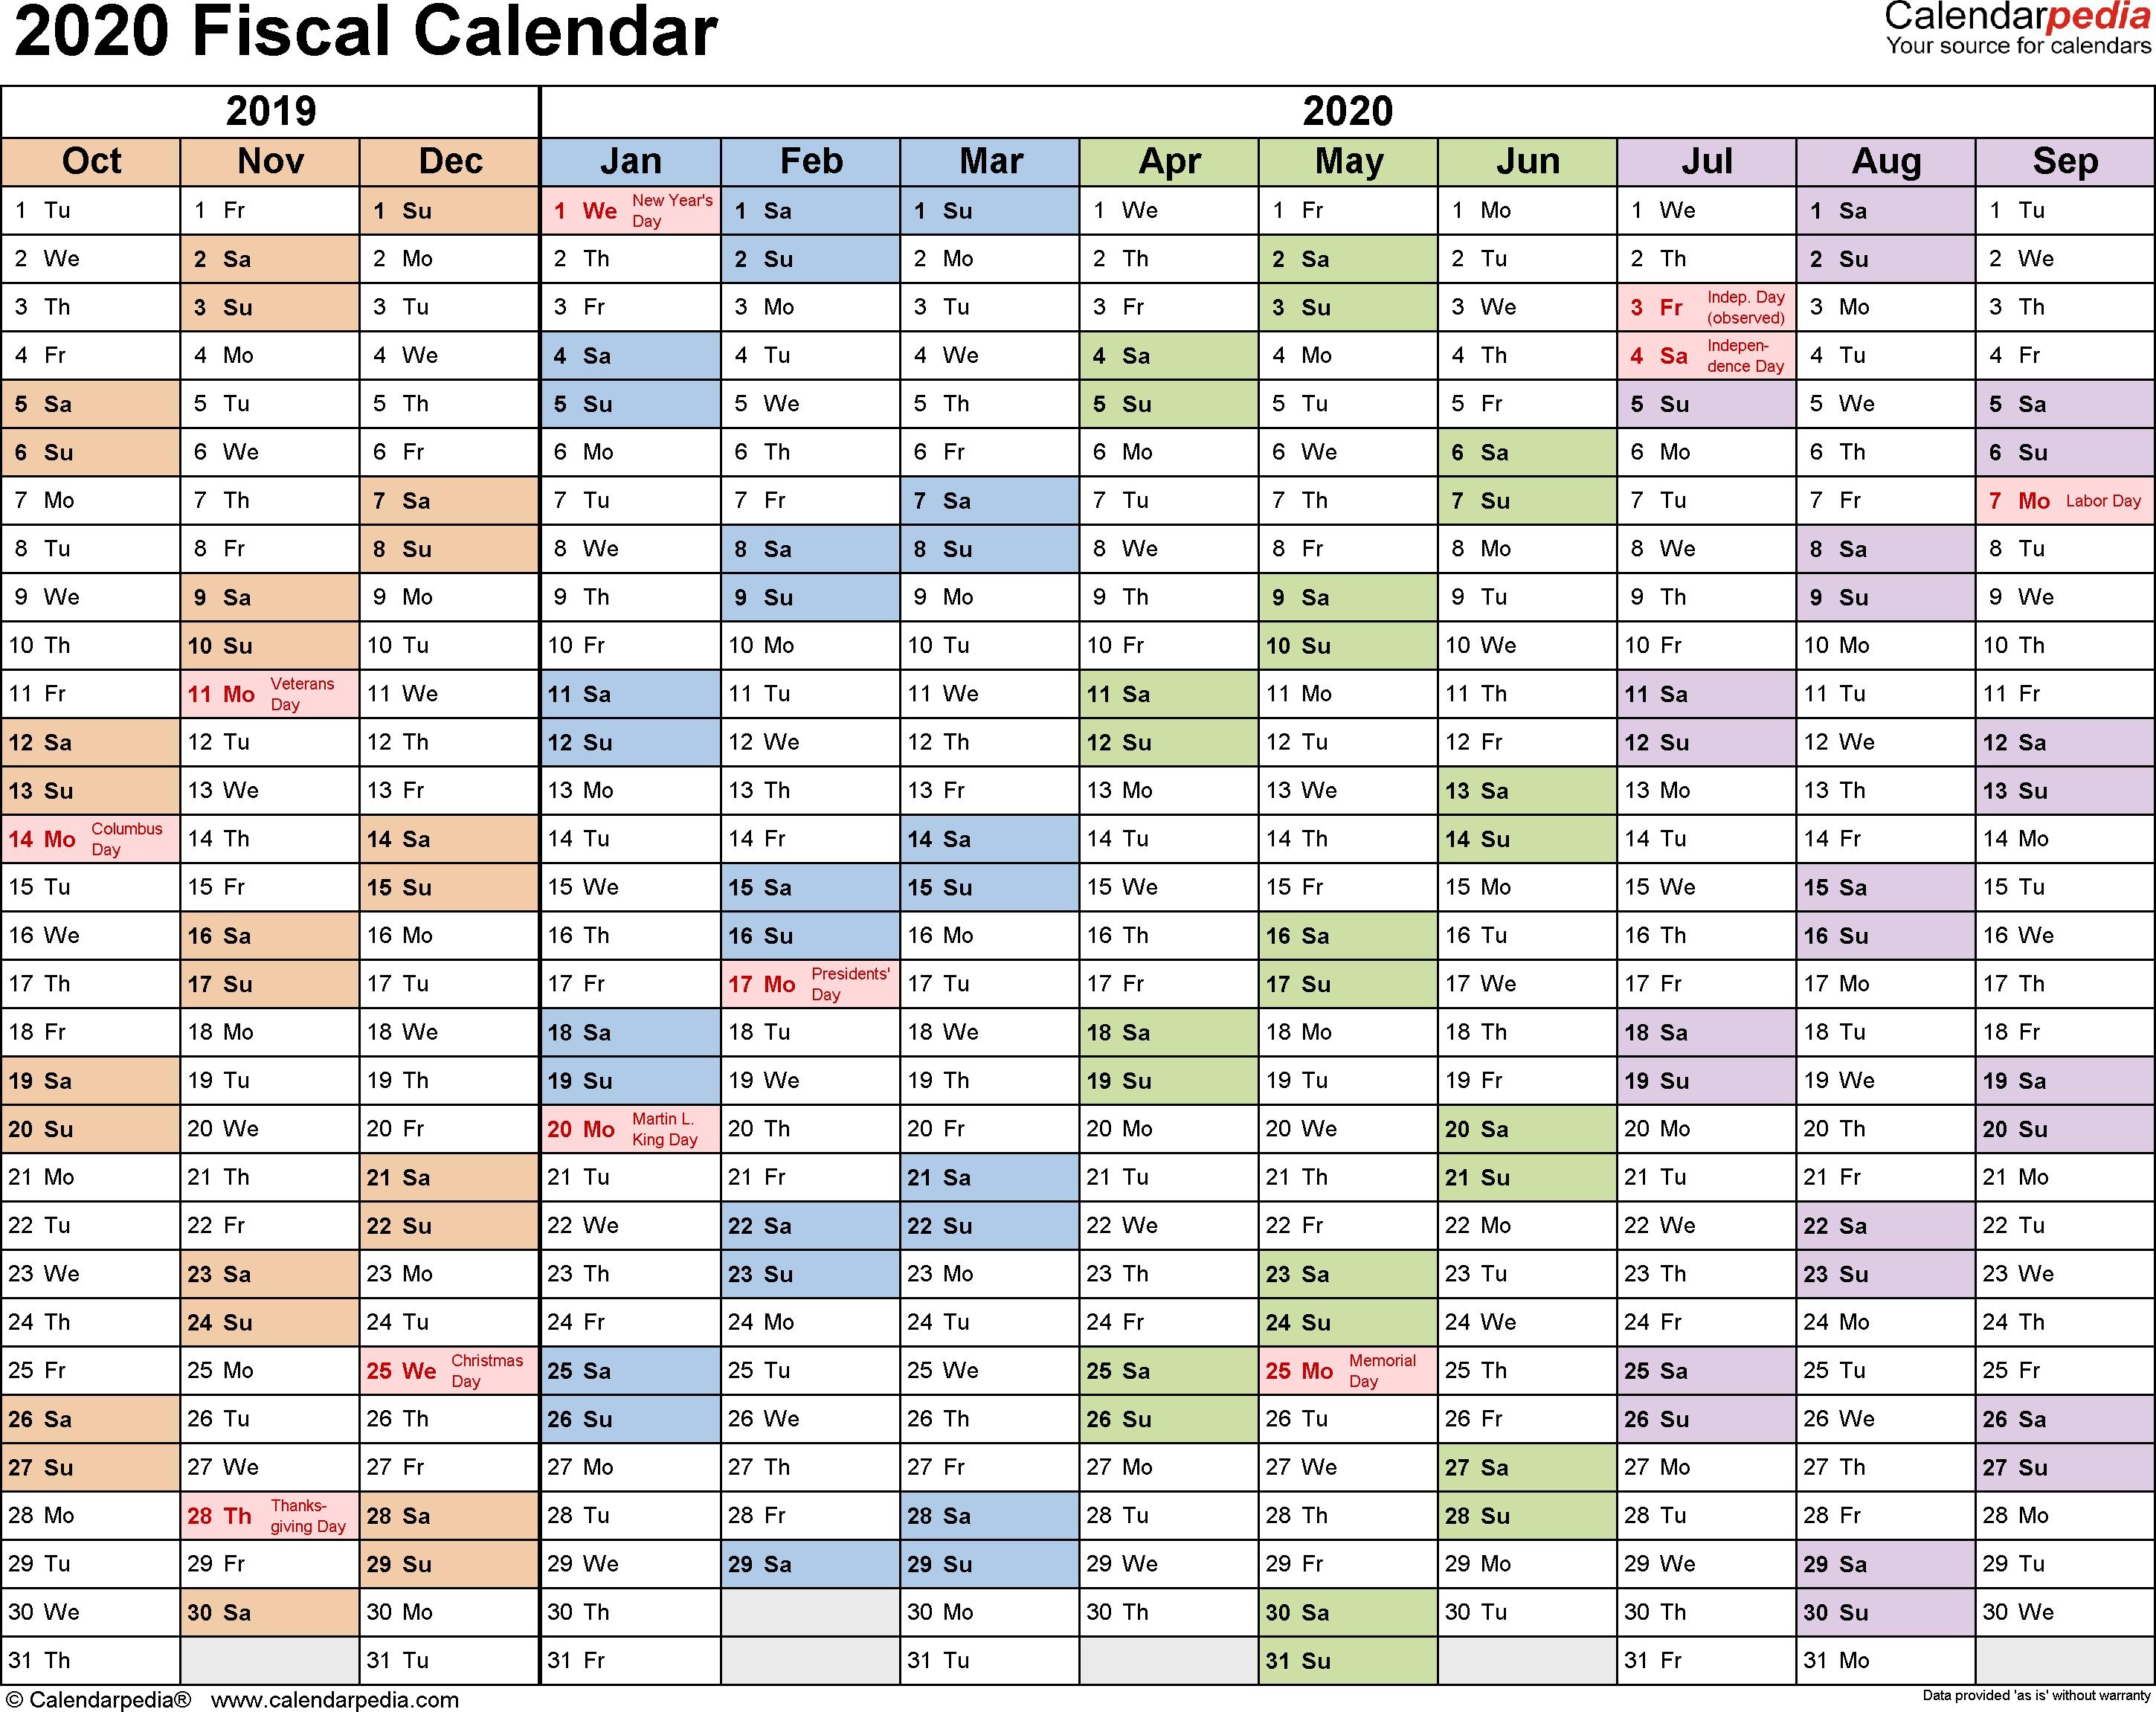 Fiscal Calendars 2020 As Free Printable Pdf Templates  2020 Financial Year Calendar